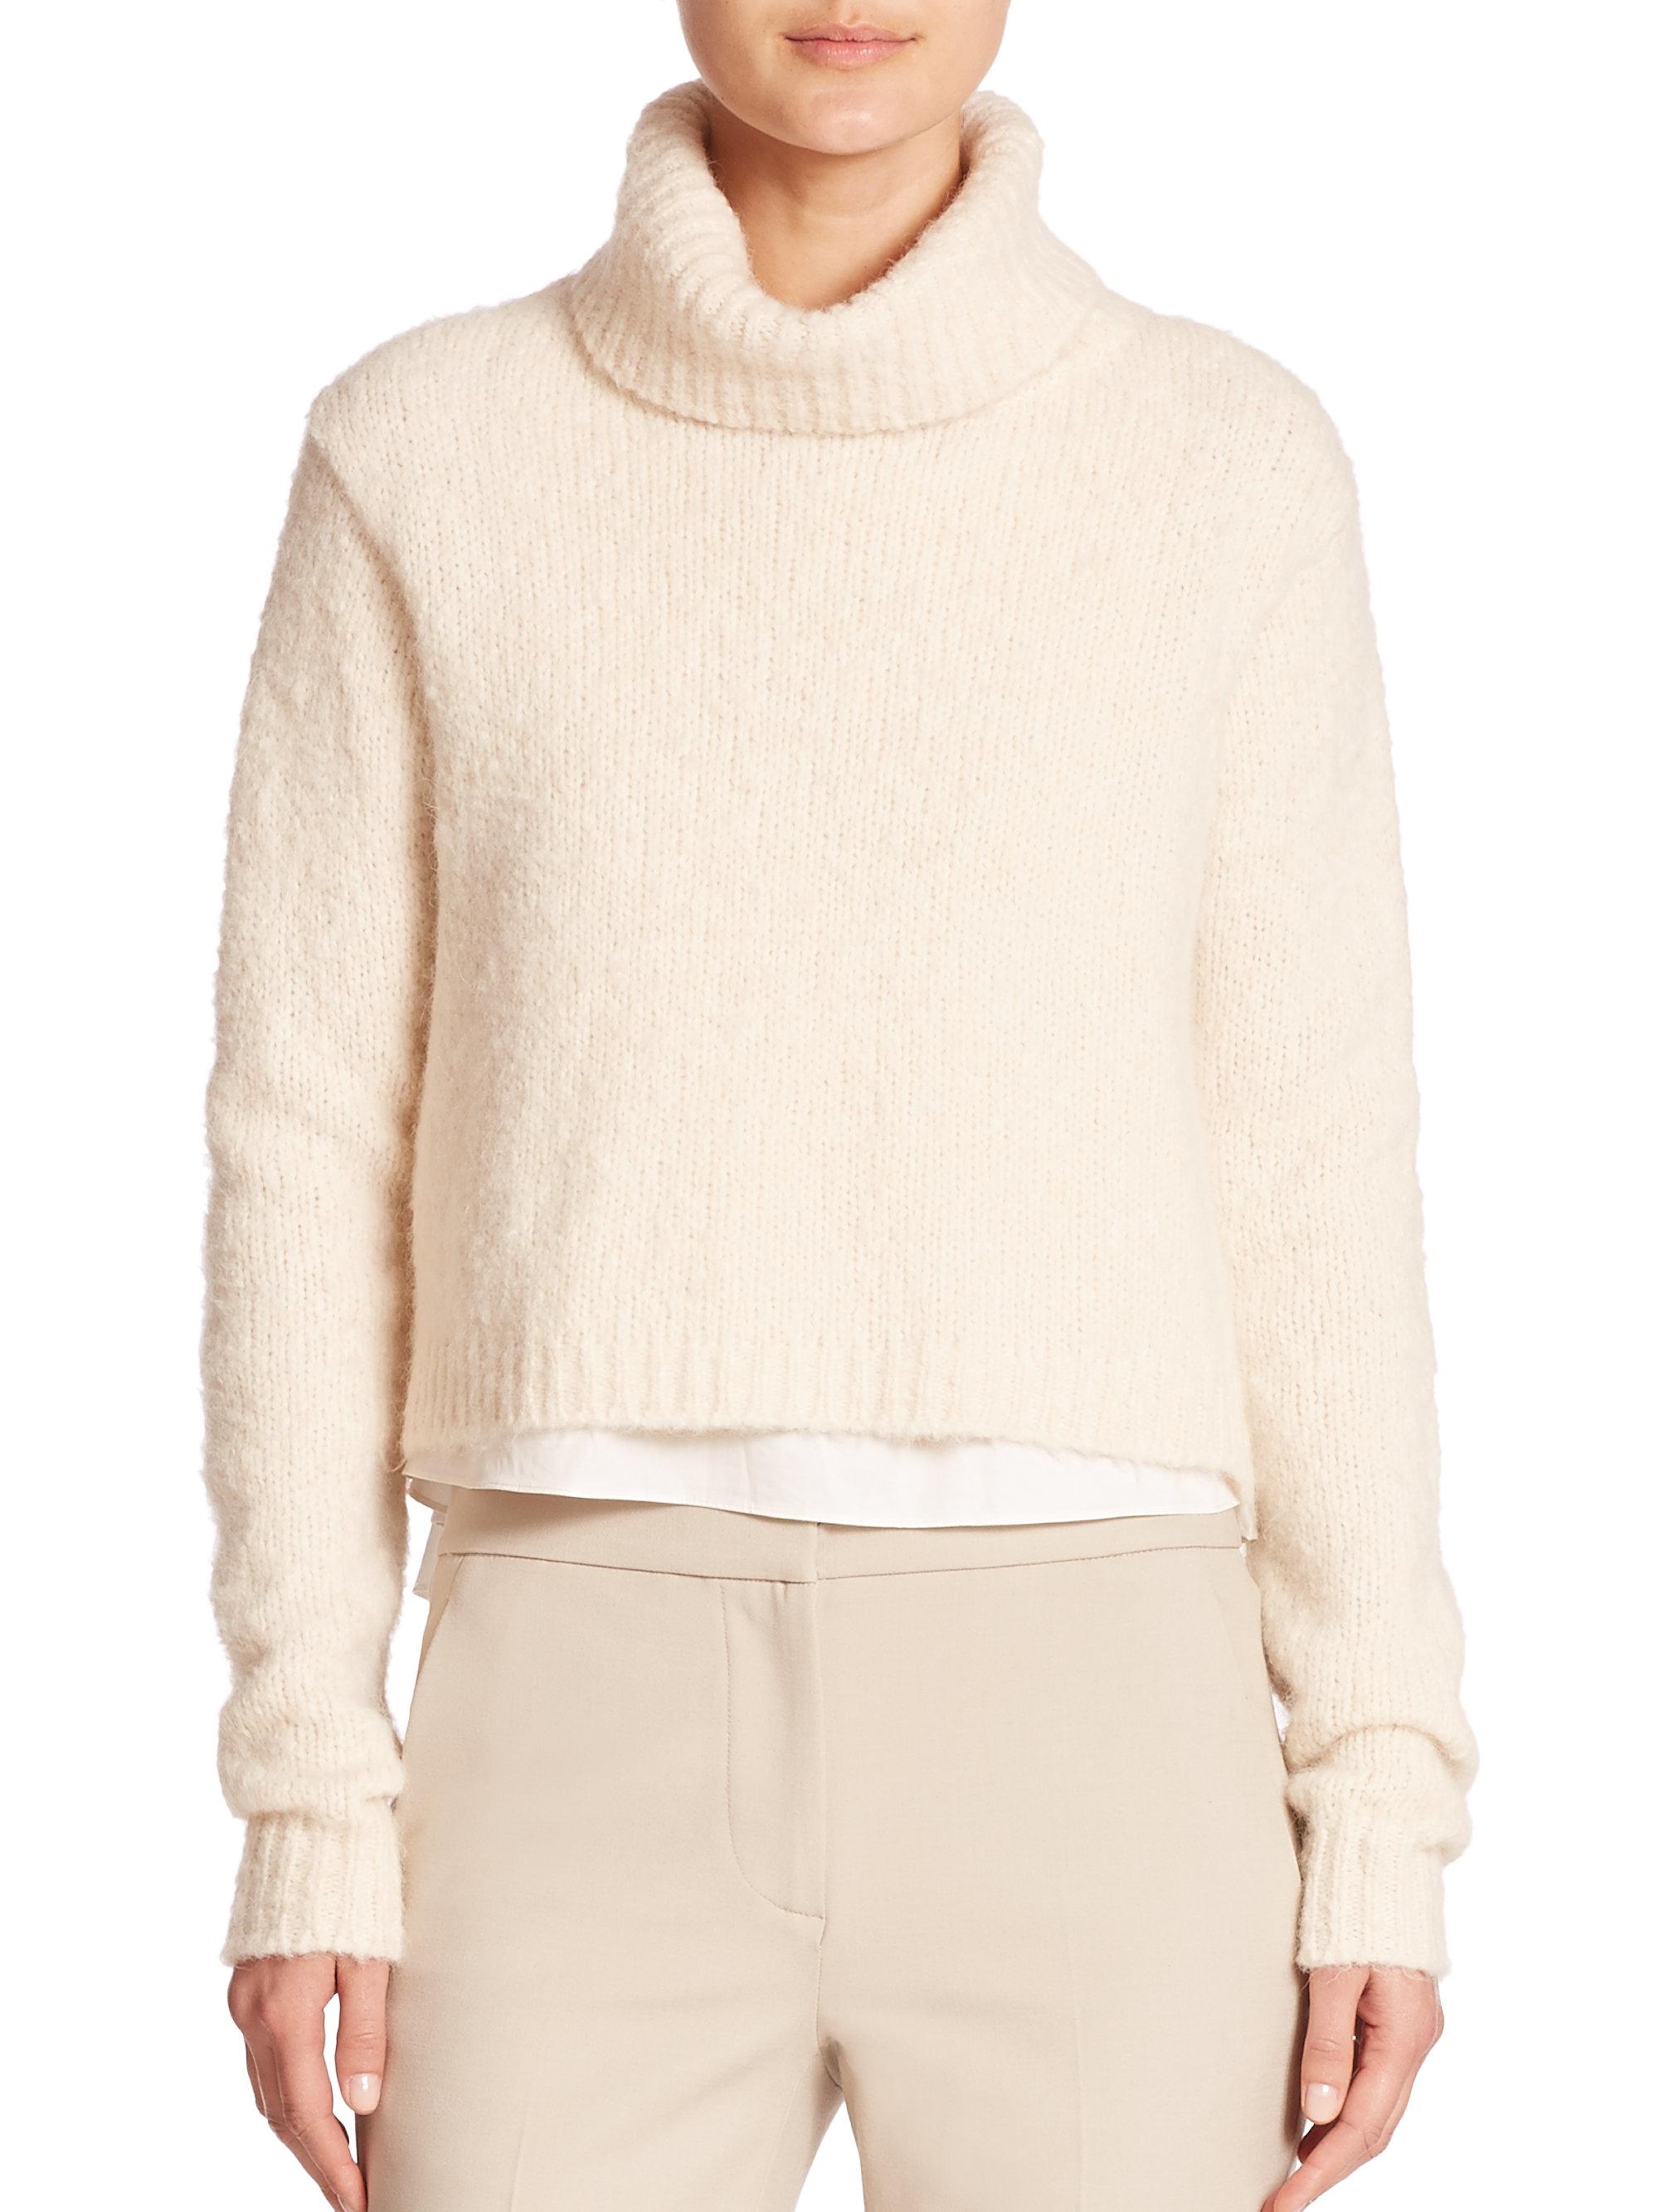 Tibi Merino Wool & Cotton Layered Cropped Sweater in White | Lyst